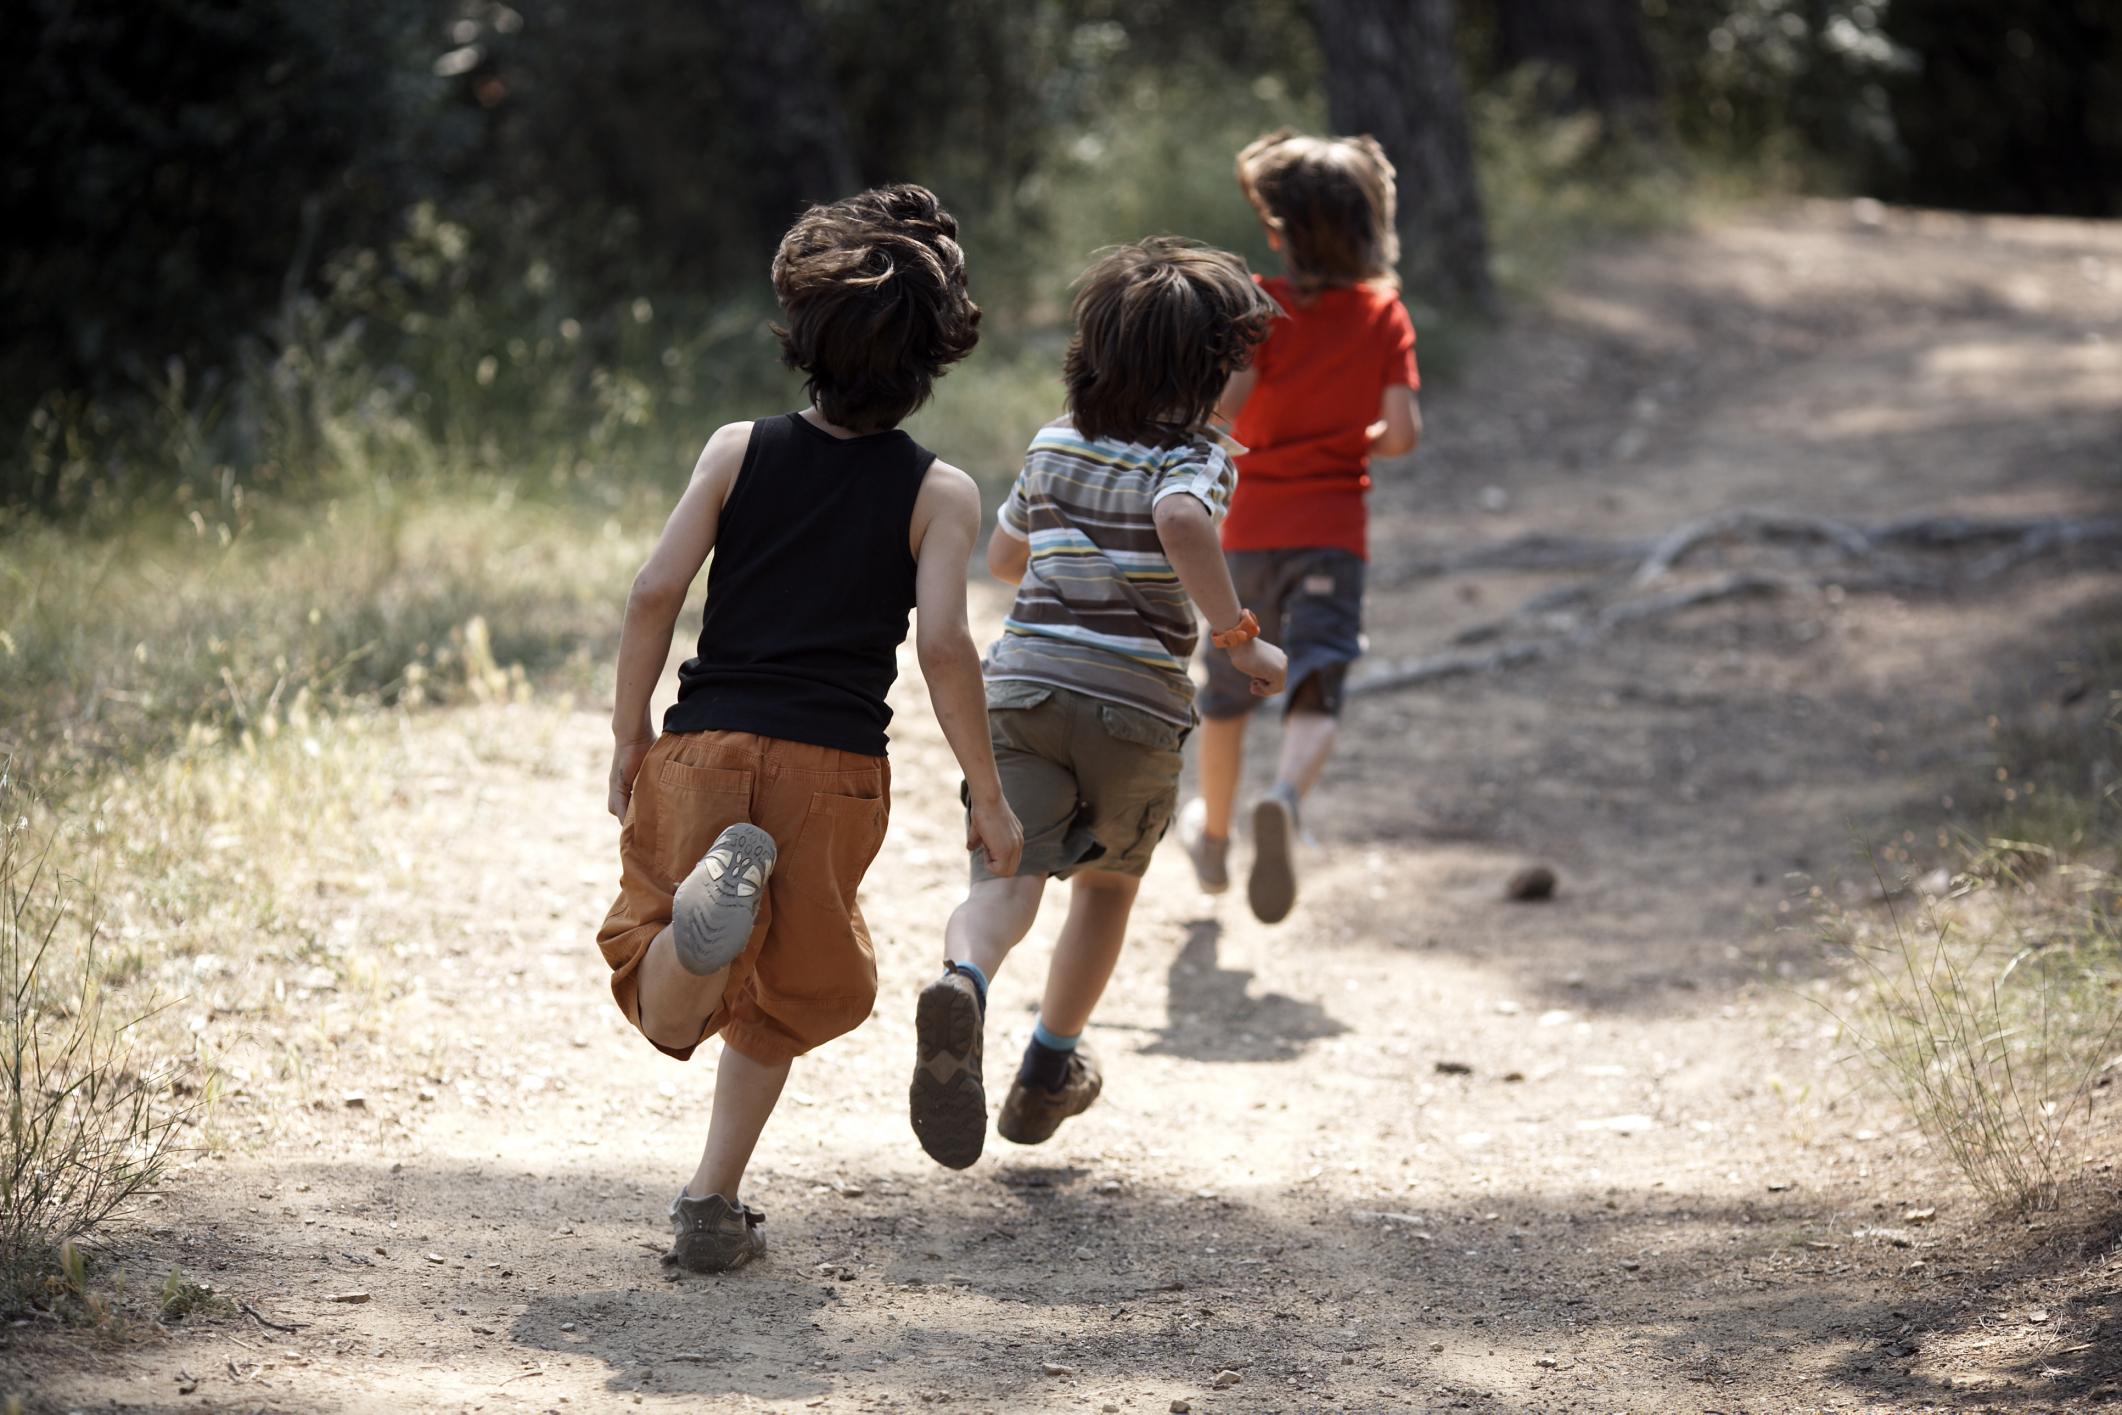 the signs of violent behaviors in children